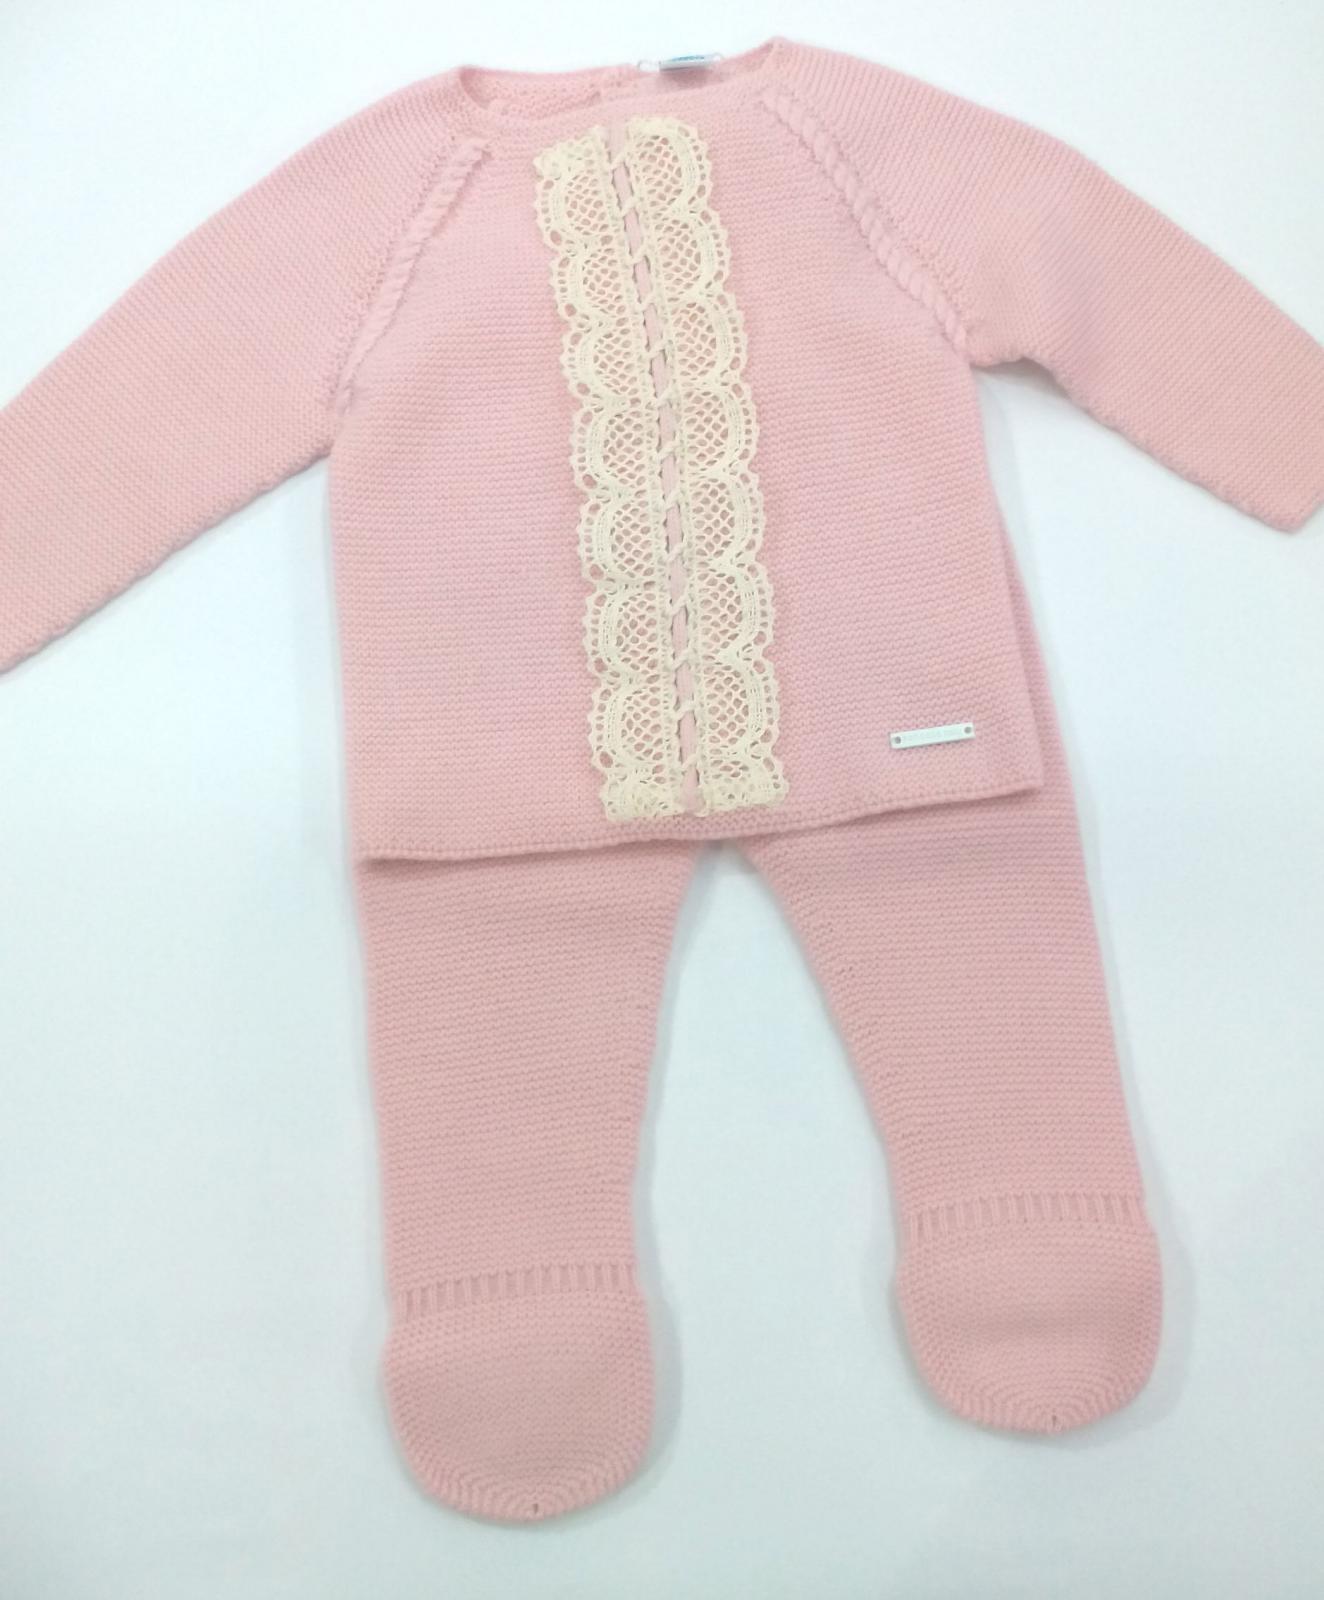 Conjunto de niña de canastilla en rosa empolvado de Pangasa.